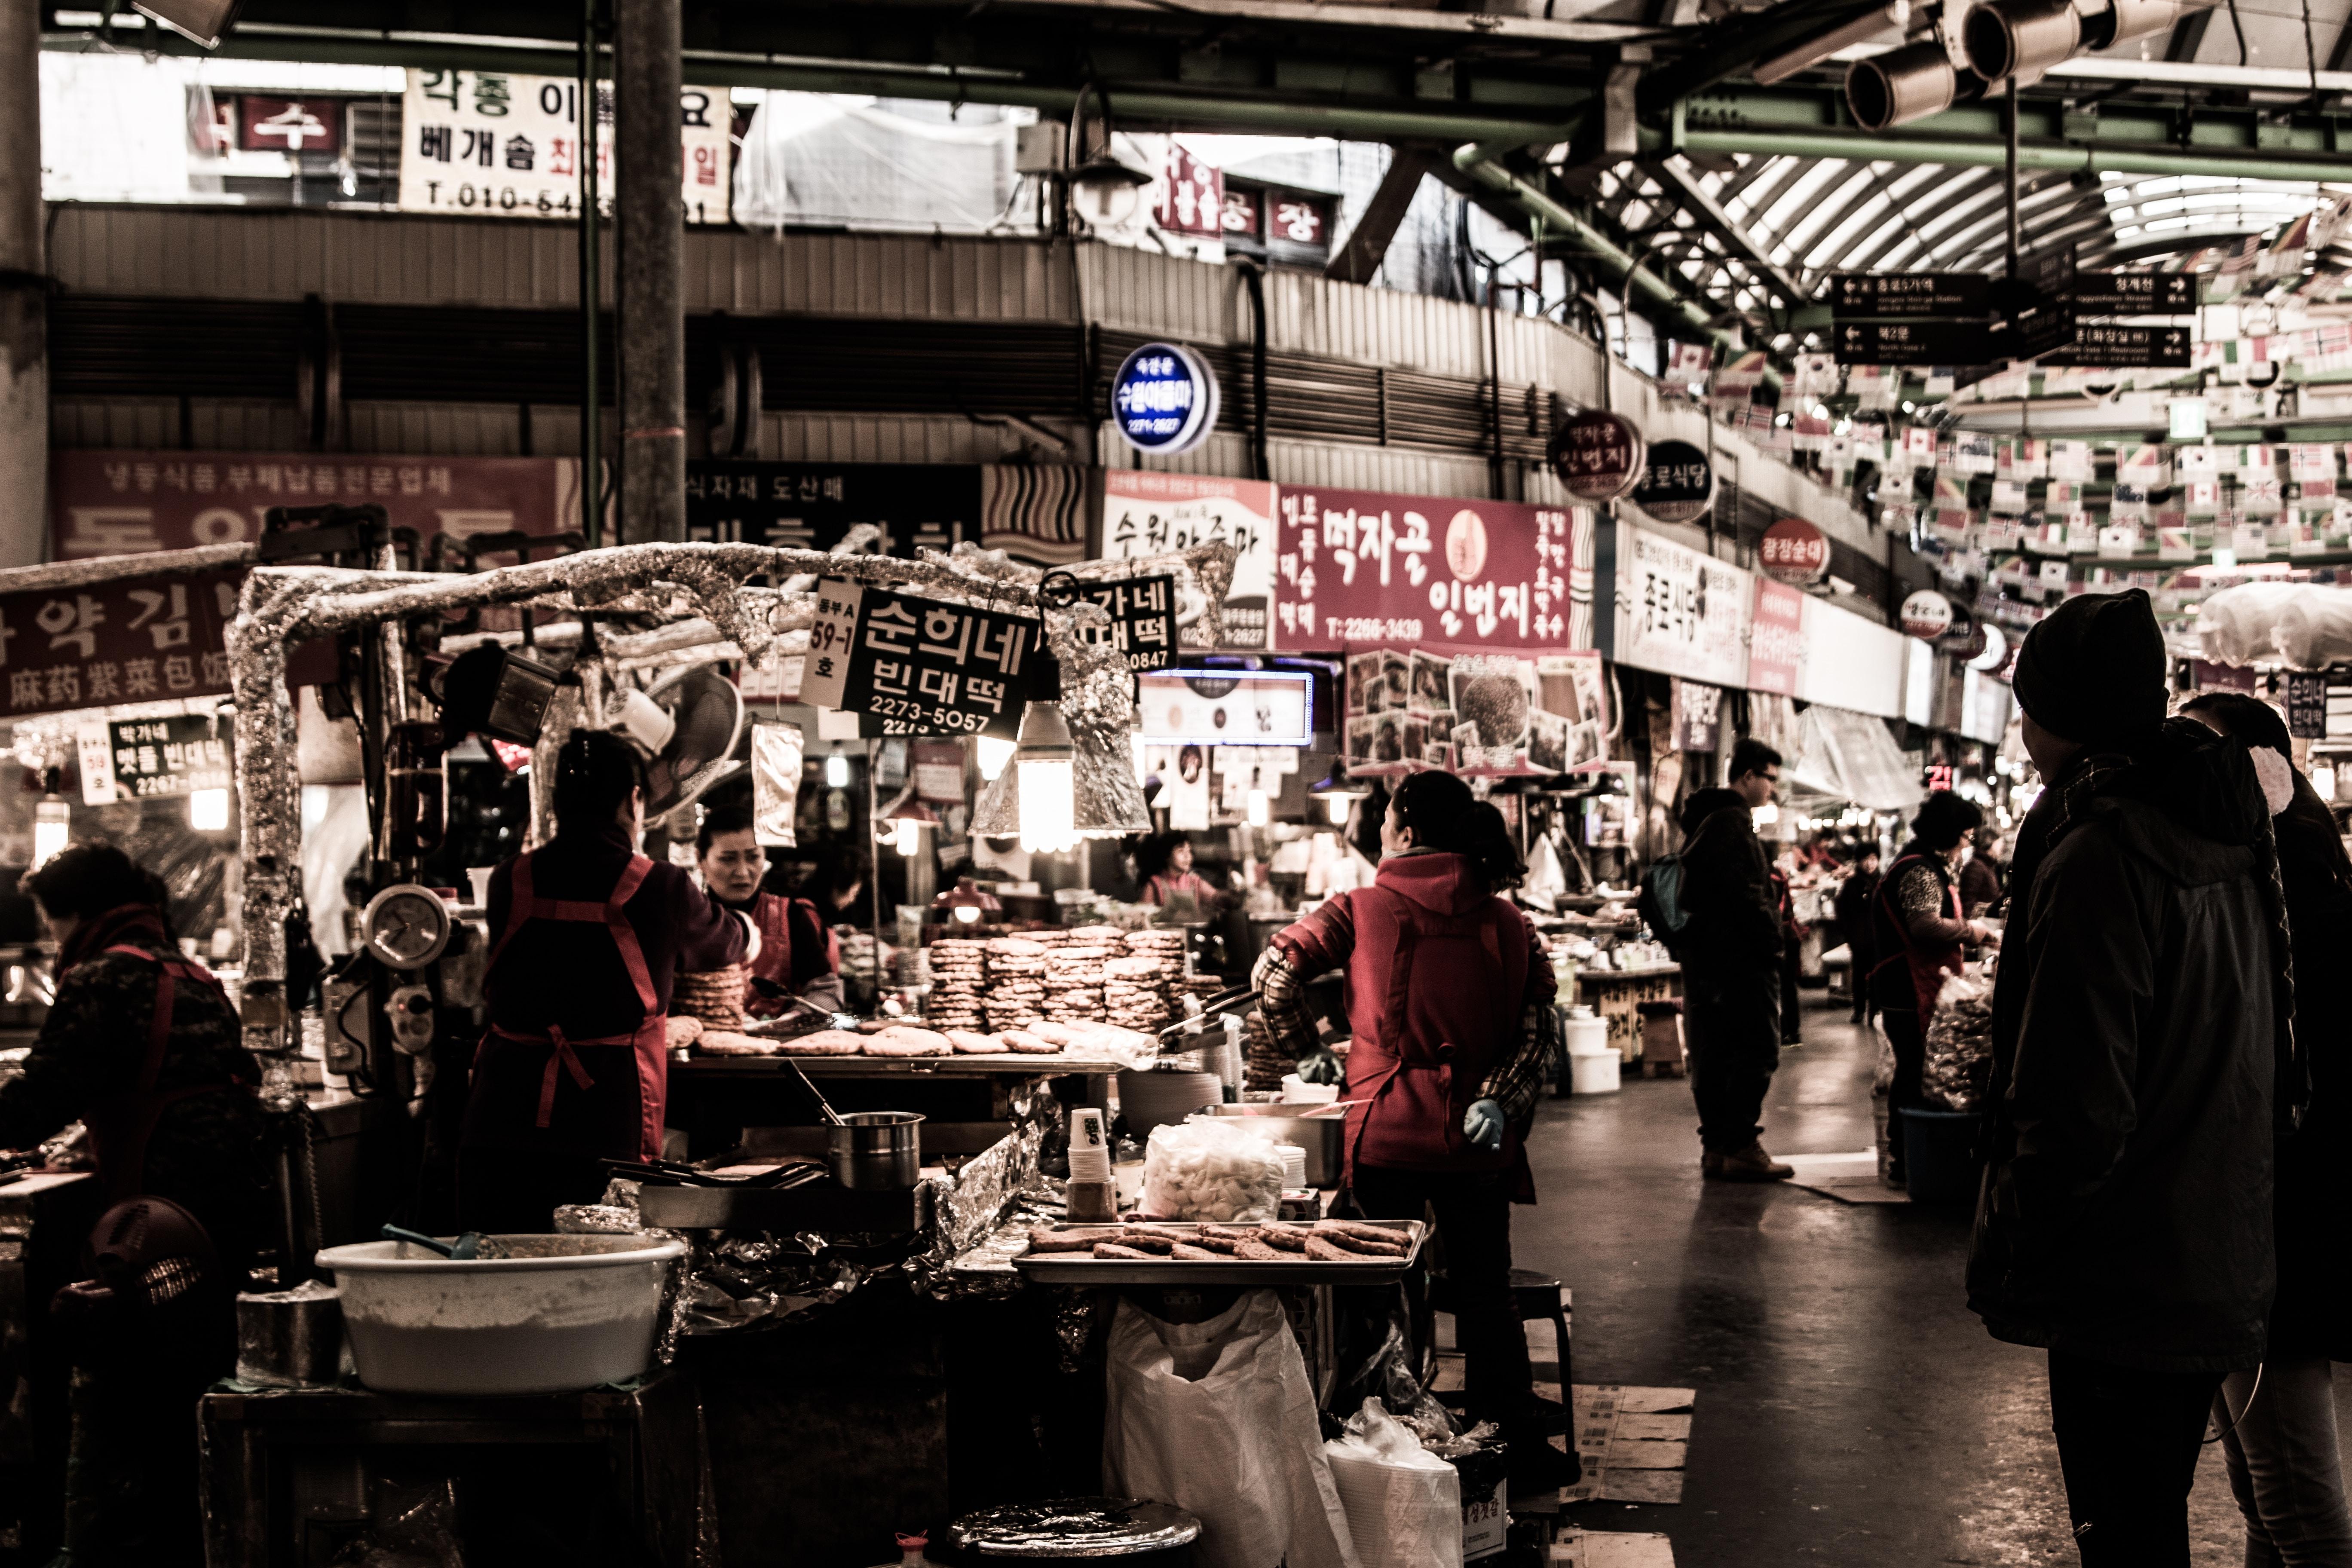 A bustling street market in an Asian city